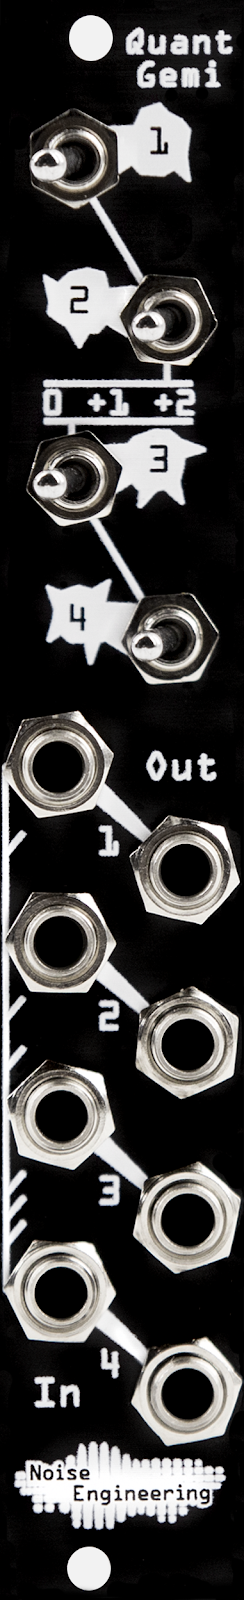 MATRIXSYNTH: Demo: Quantus Pax precision adder/transposer +